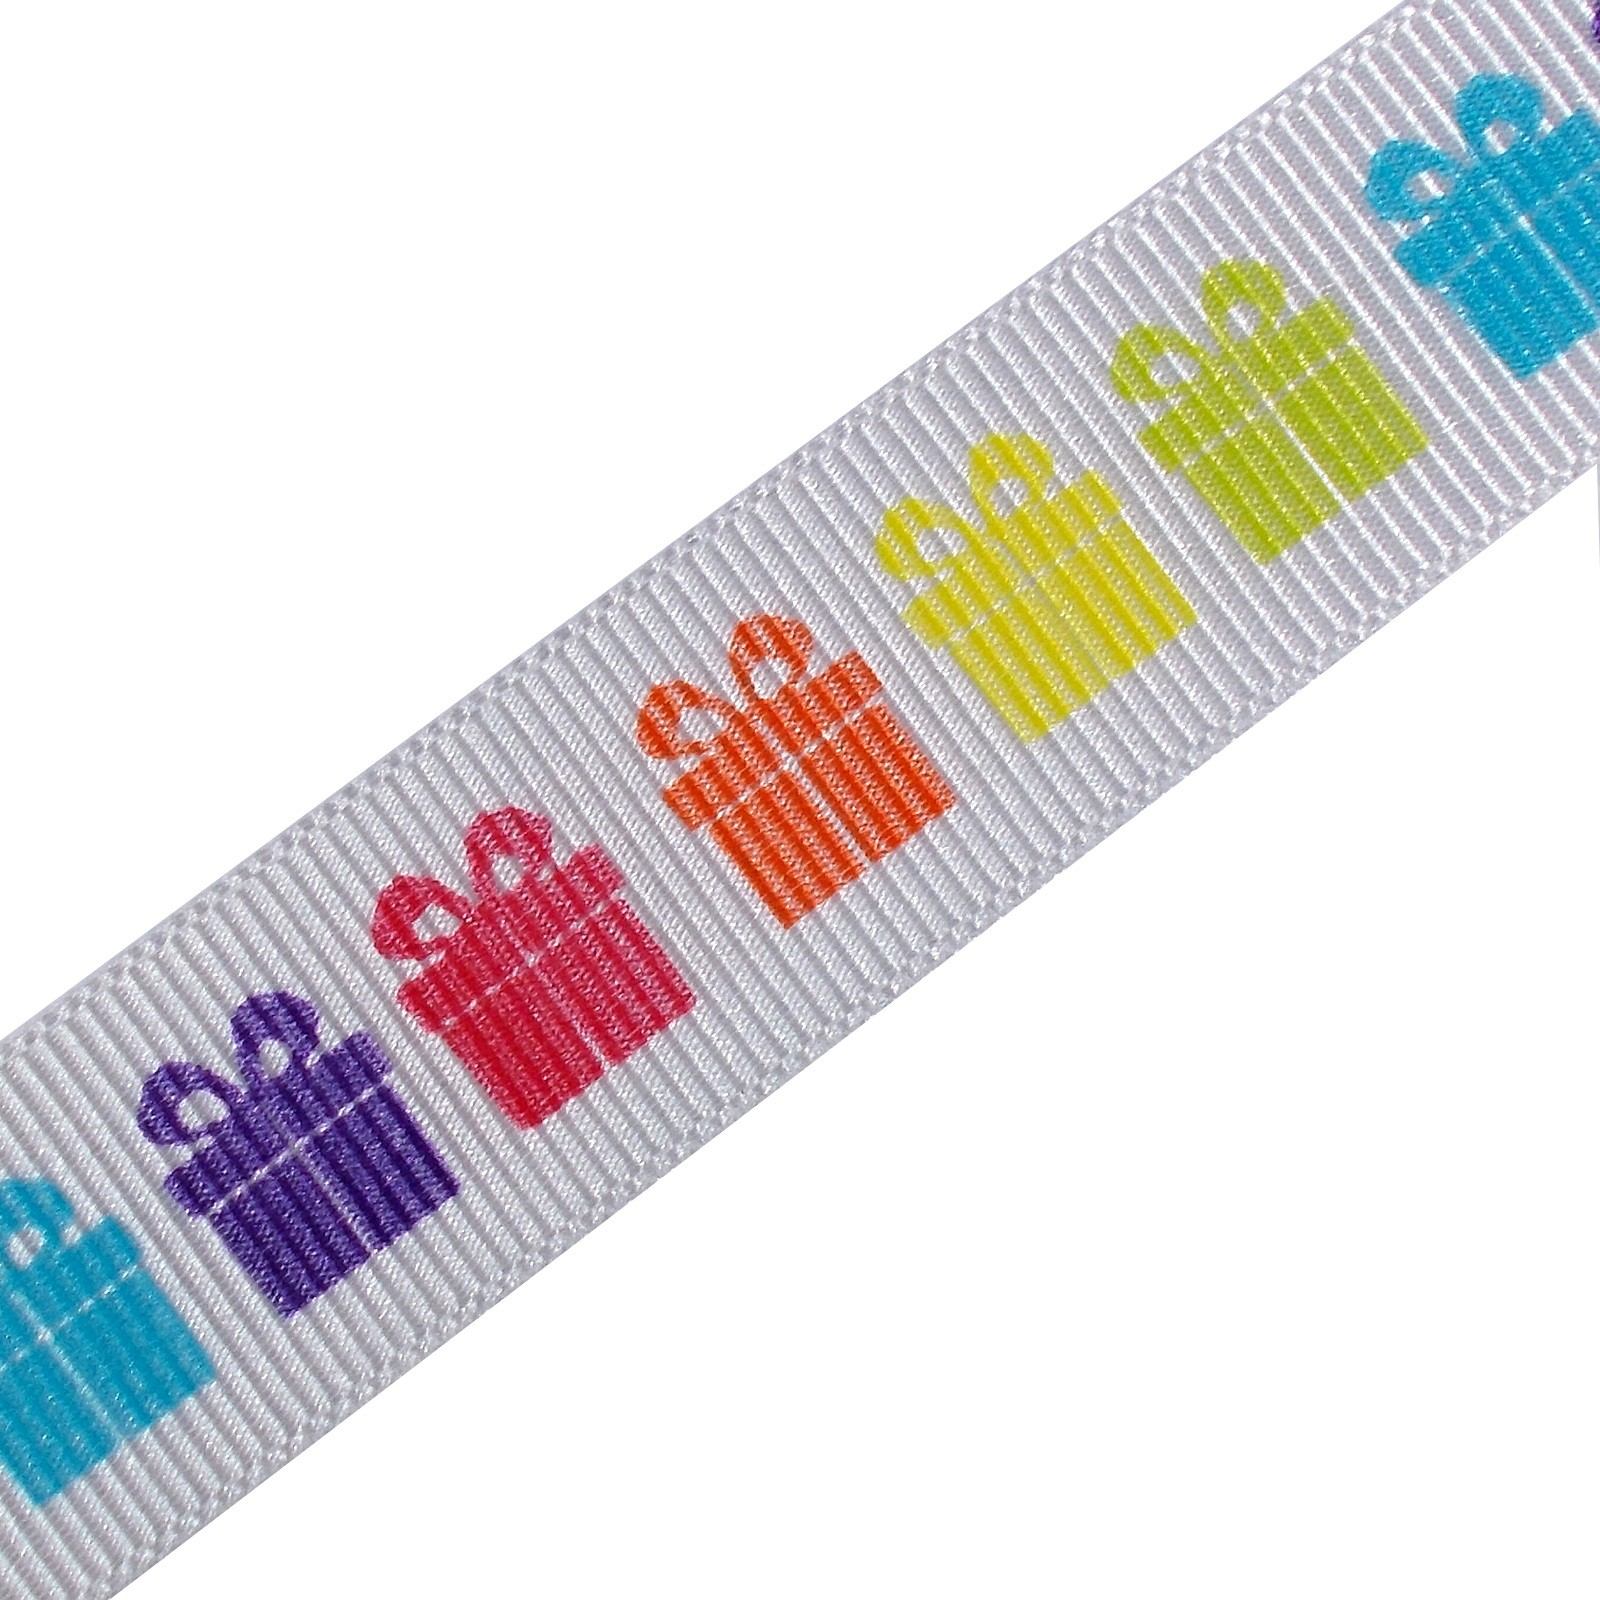 Berisfords Bright Rainbow Grosgrain Ribbon 25mm wide Parcel Gifts 1 metre length